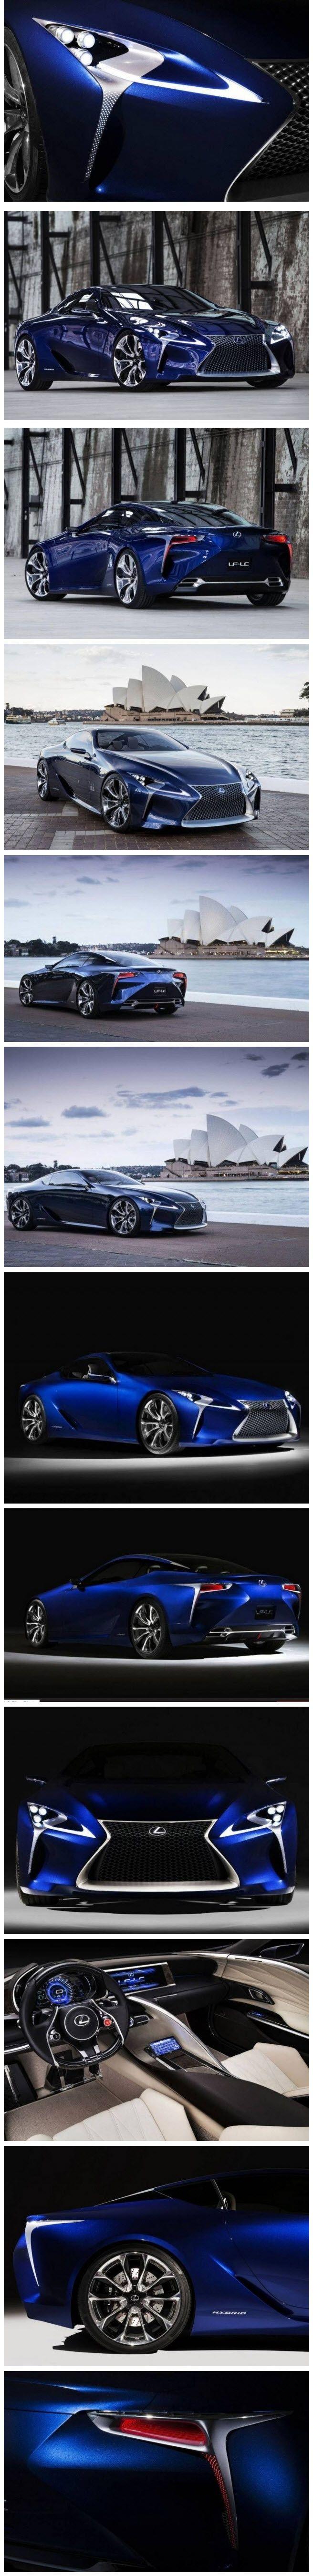 Lexus LF-LC Concept  http://vykonkom.com/category/luxury-cars/